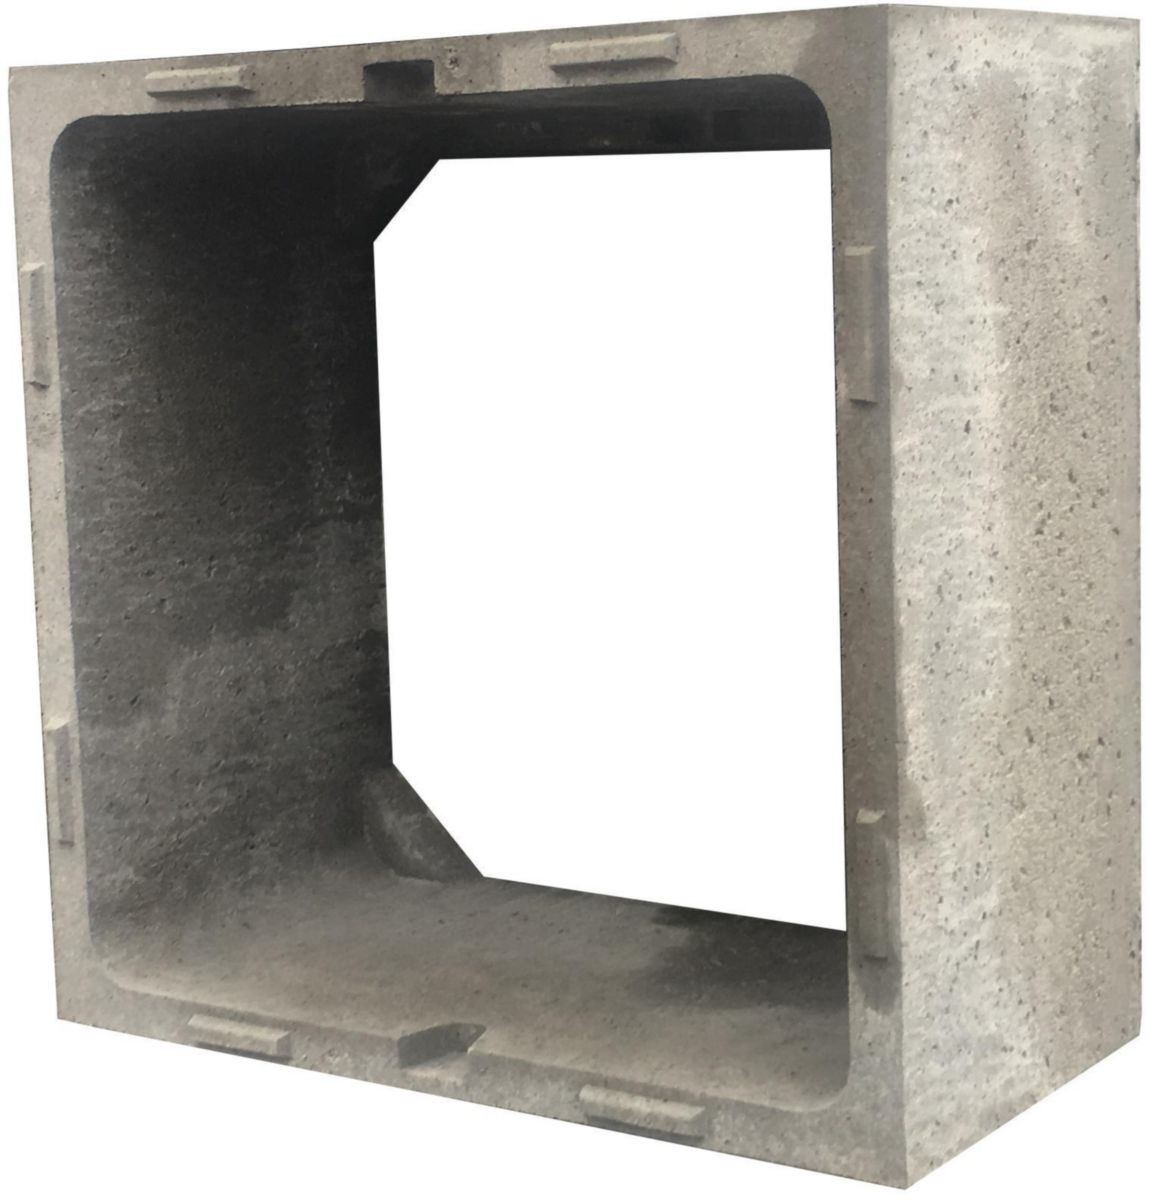 rehausse beton 80 80 construction maison b ton arm. Black Bedroom Furniture Sets. Home Design Ideas